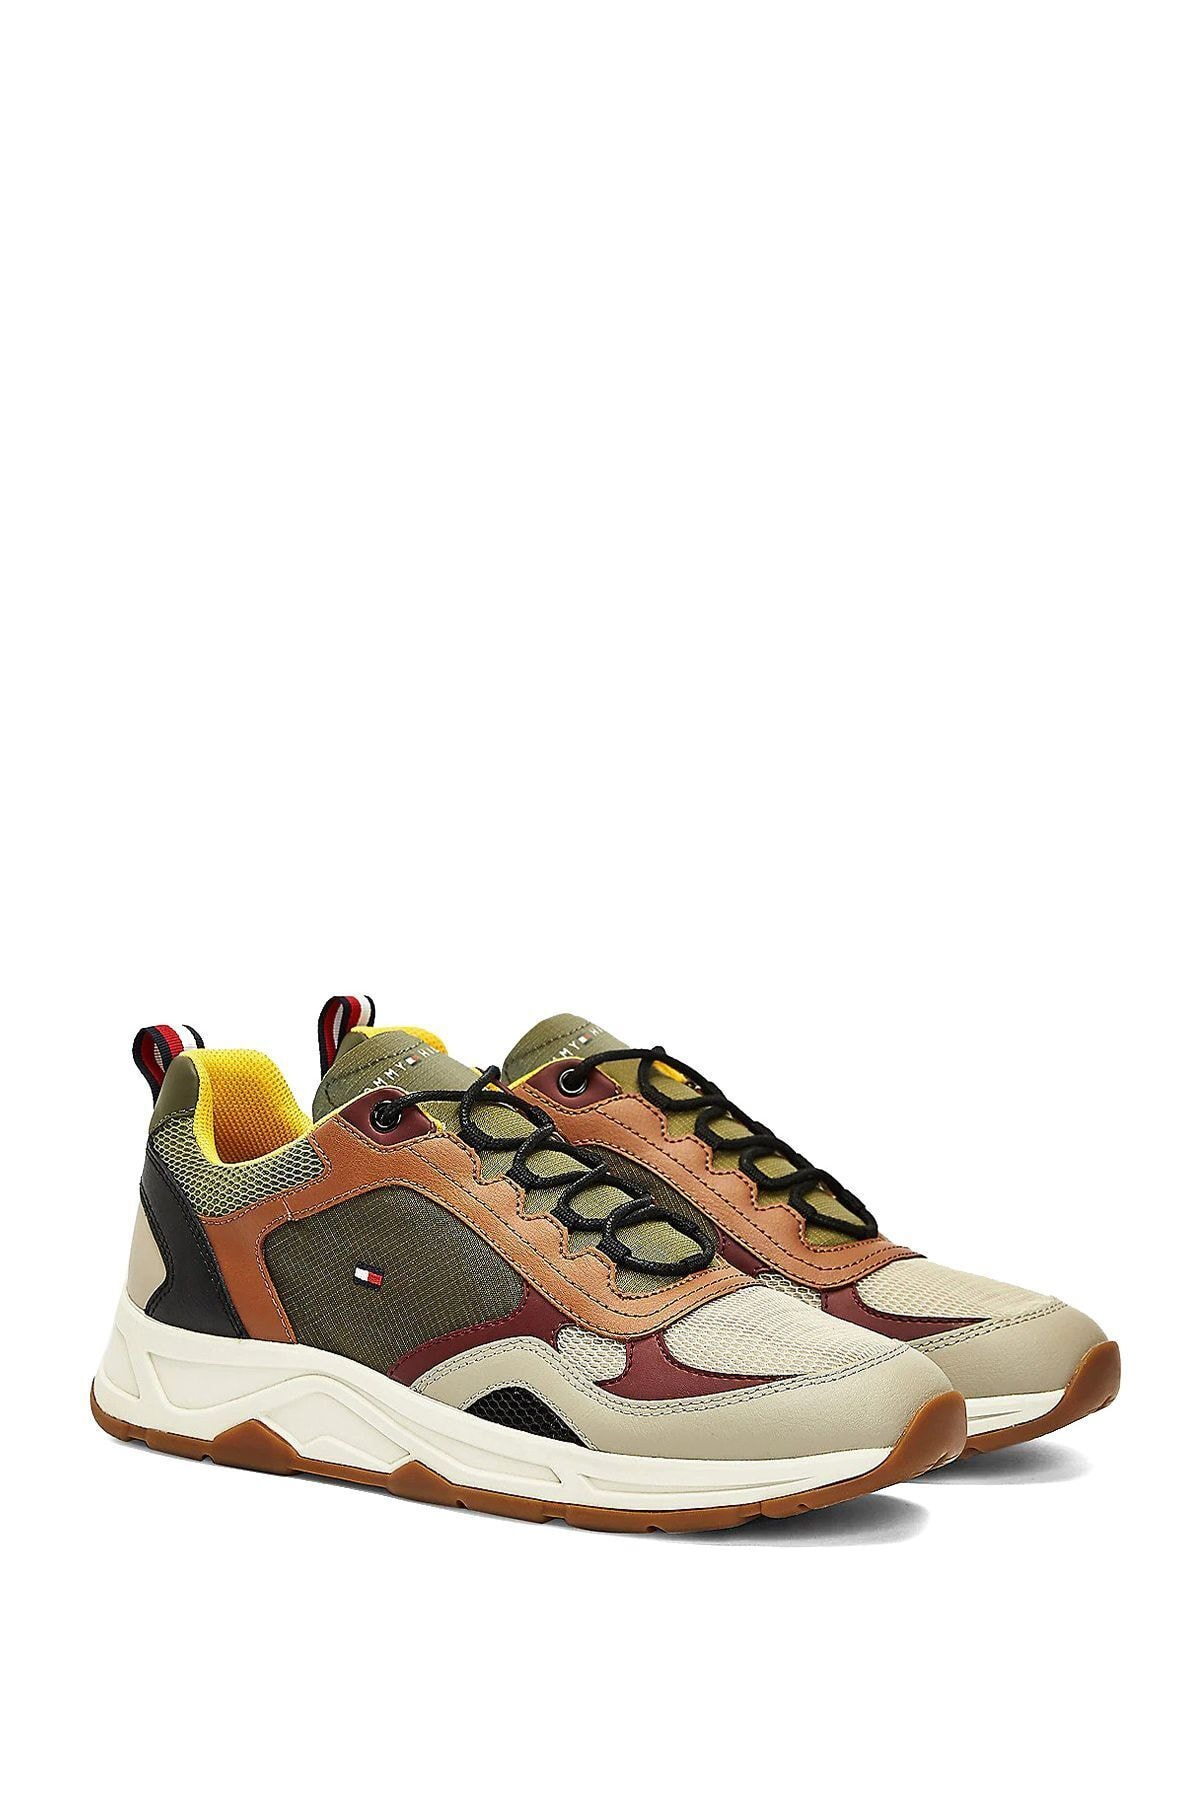 Tommy Hilfiger Erkek Kahverengi Fashion Mix Sneaker Ayakkabı Fm0fm02846 1